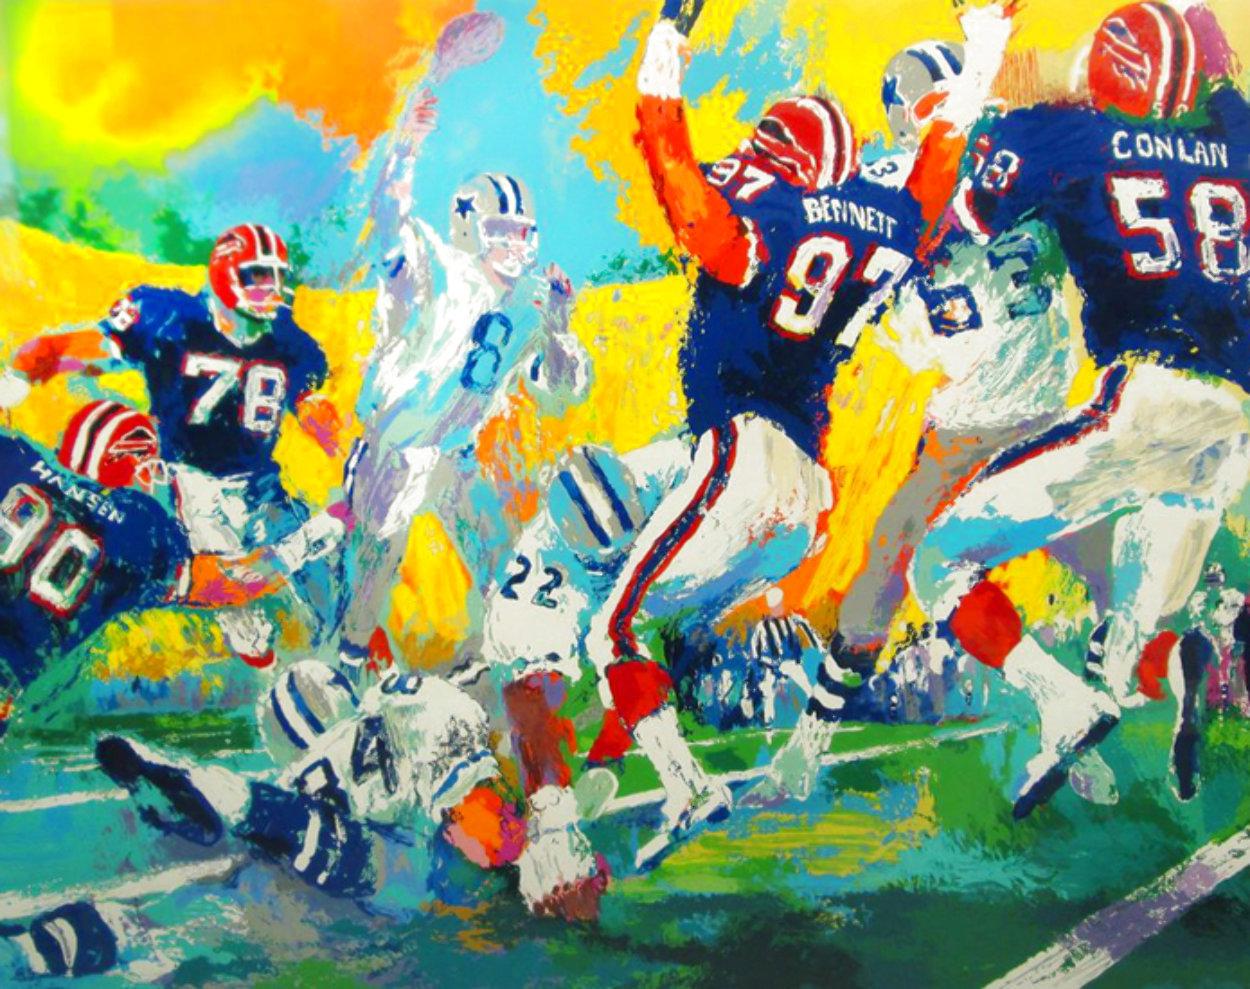 Cowboys Bills Superbowl XXVII AP  Limited Edition Print by LeRoy Neiman